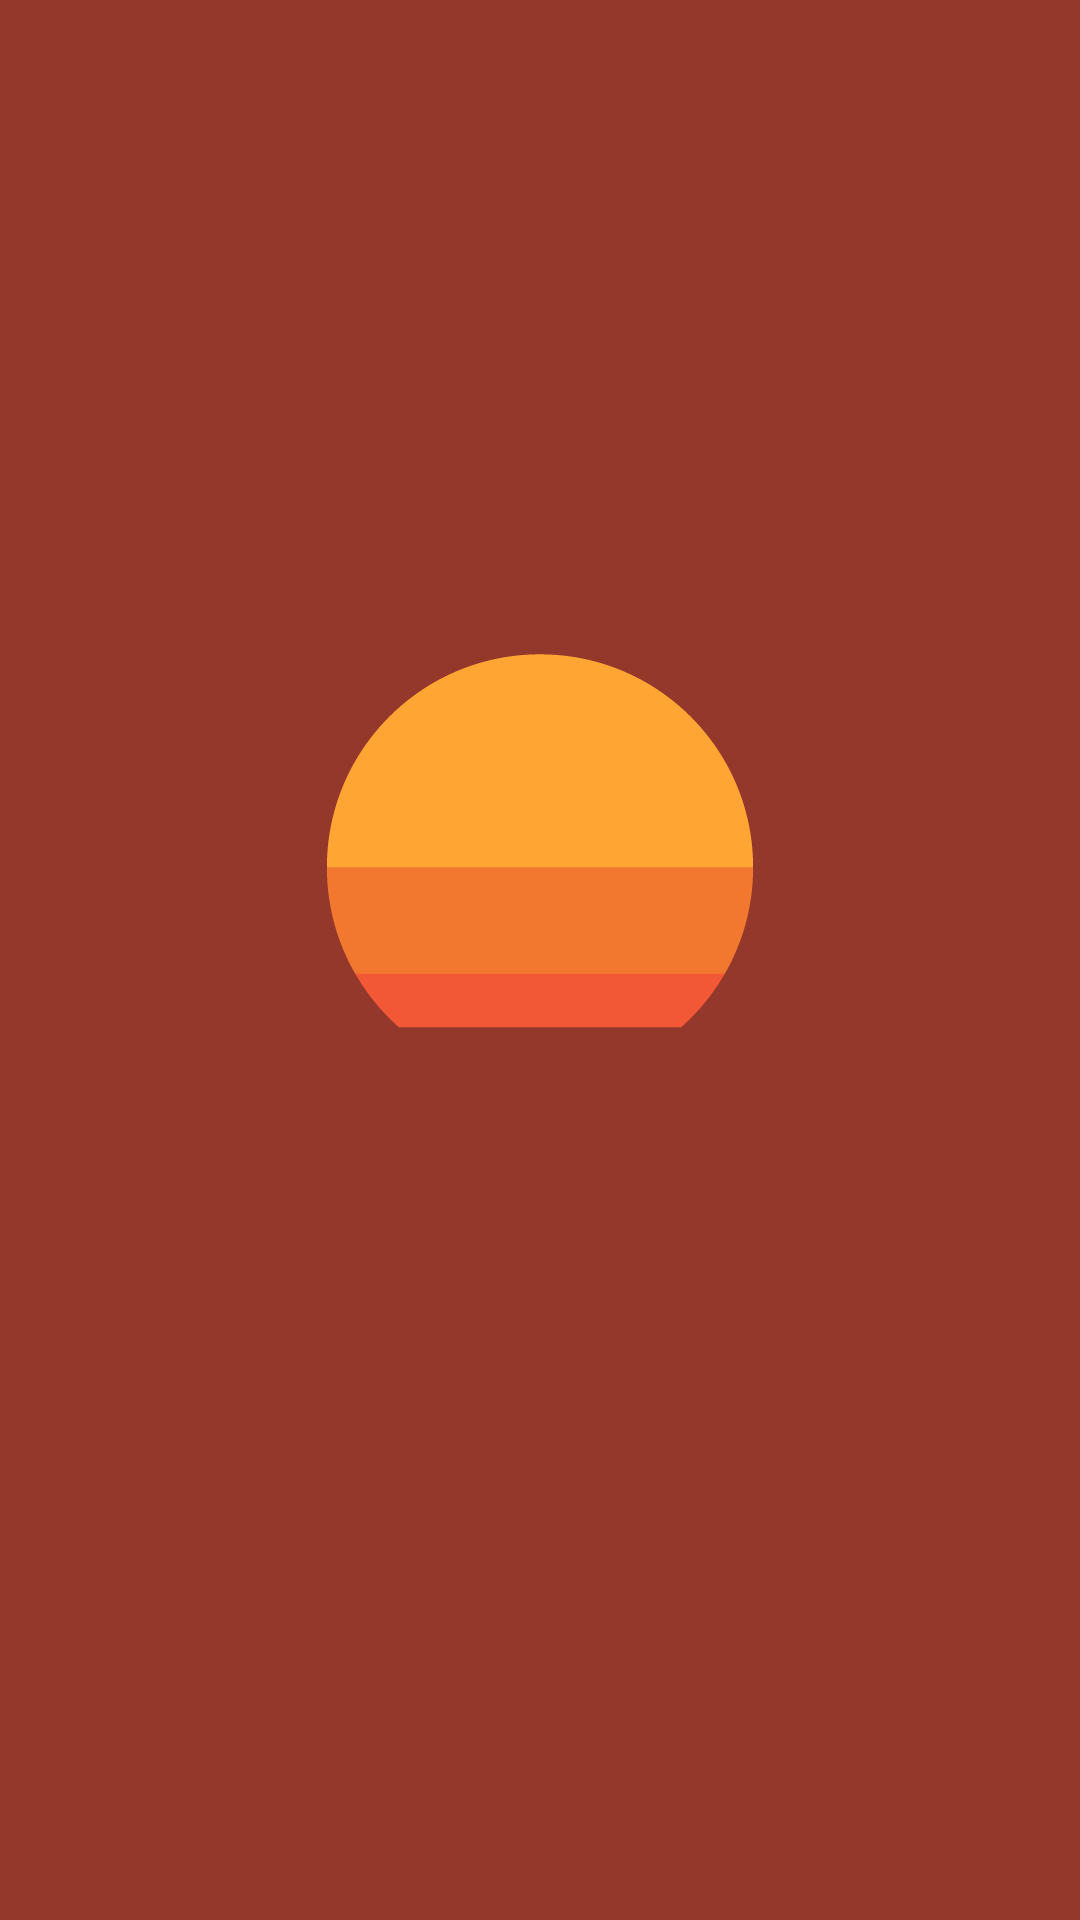 Minimalist Black Orange Phone Wallpaper · Artistic Desktop ...